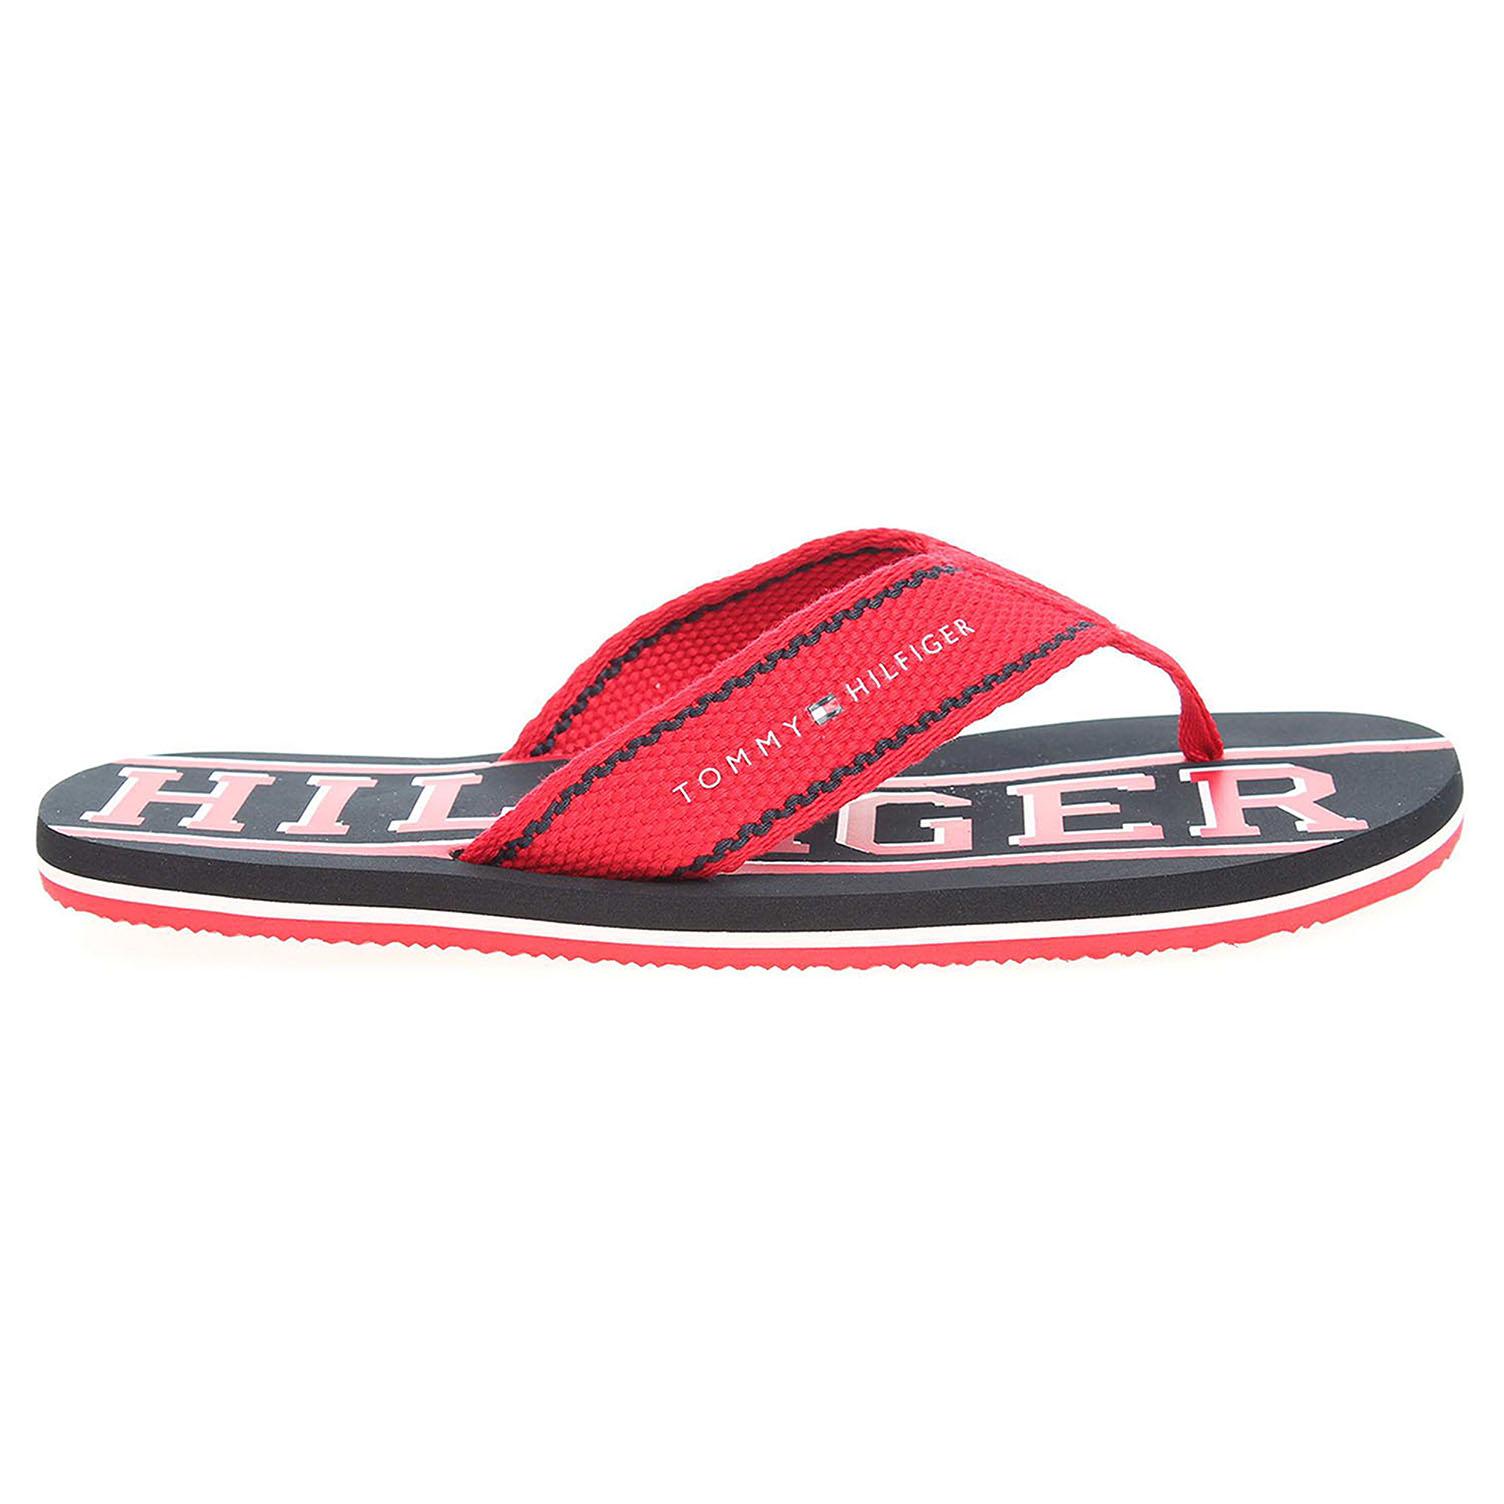 Ecco Tommy Hilfiger pánské pantofle FM0FM00276 f2285loyd 13d červené 24500127